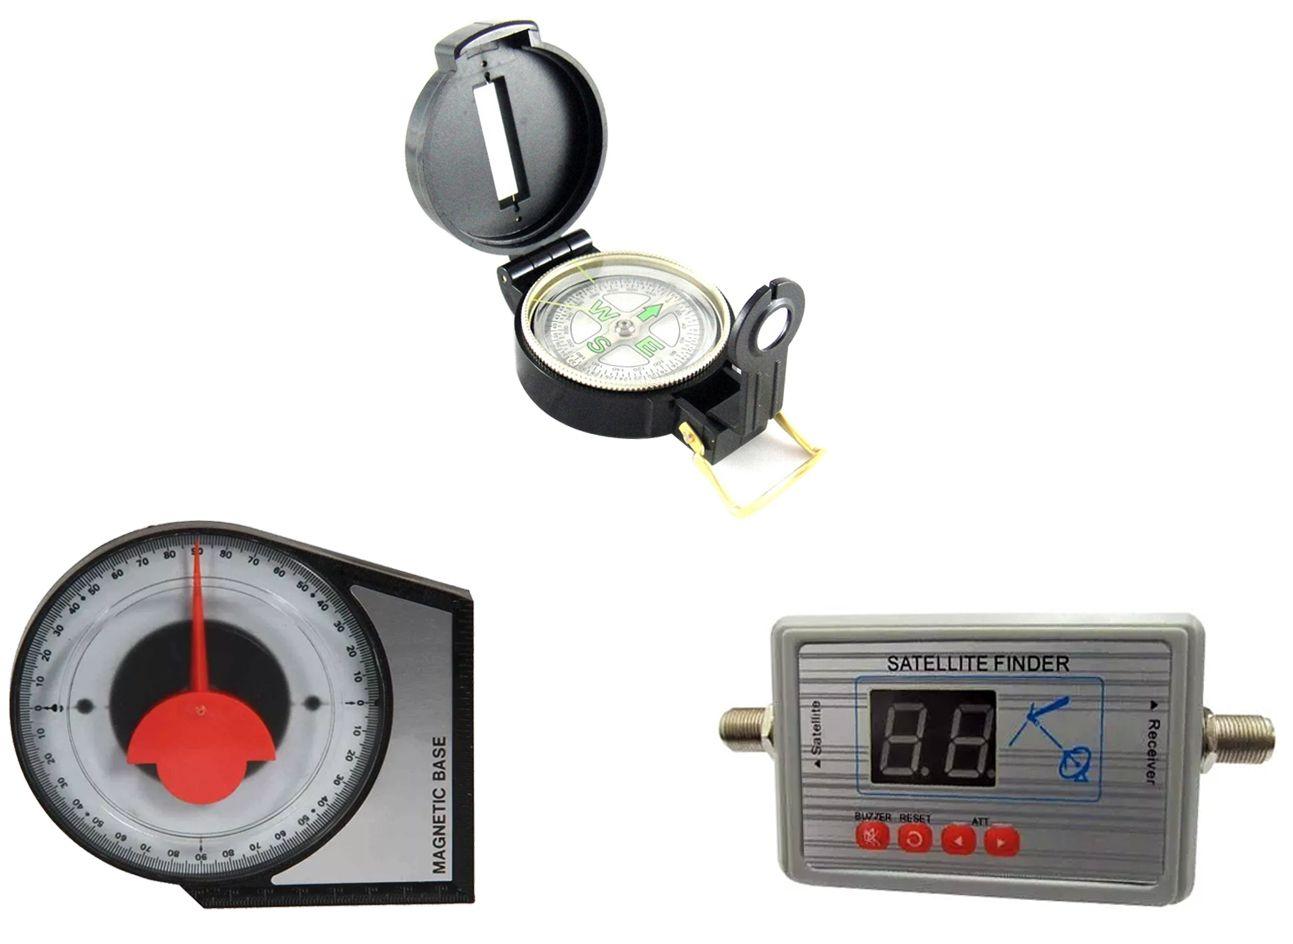 Kit Satelite Finder Medidor Digital Bussola Inclinometro